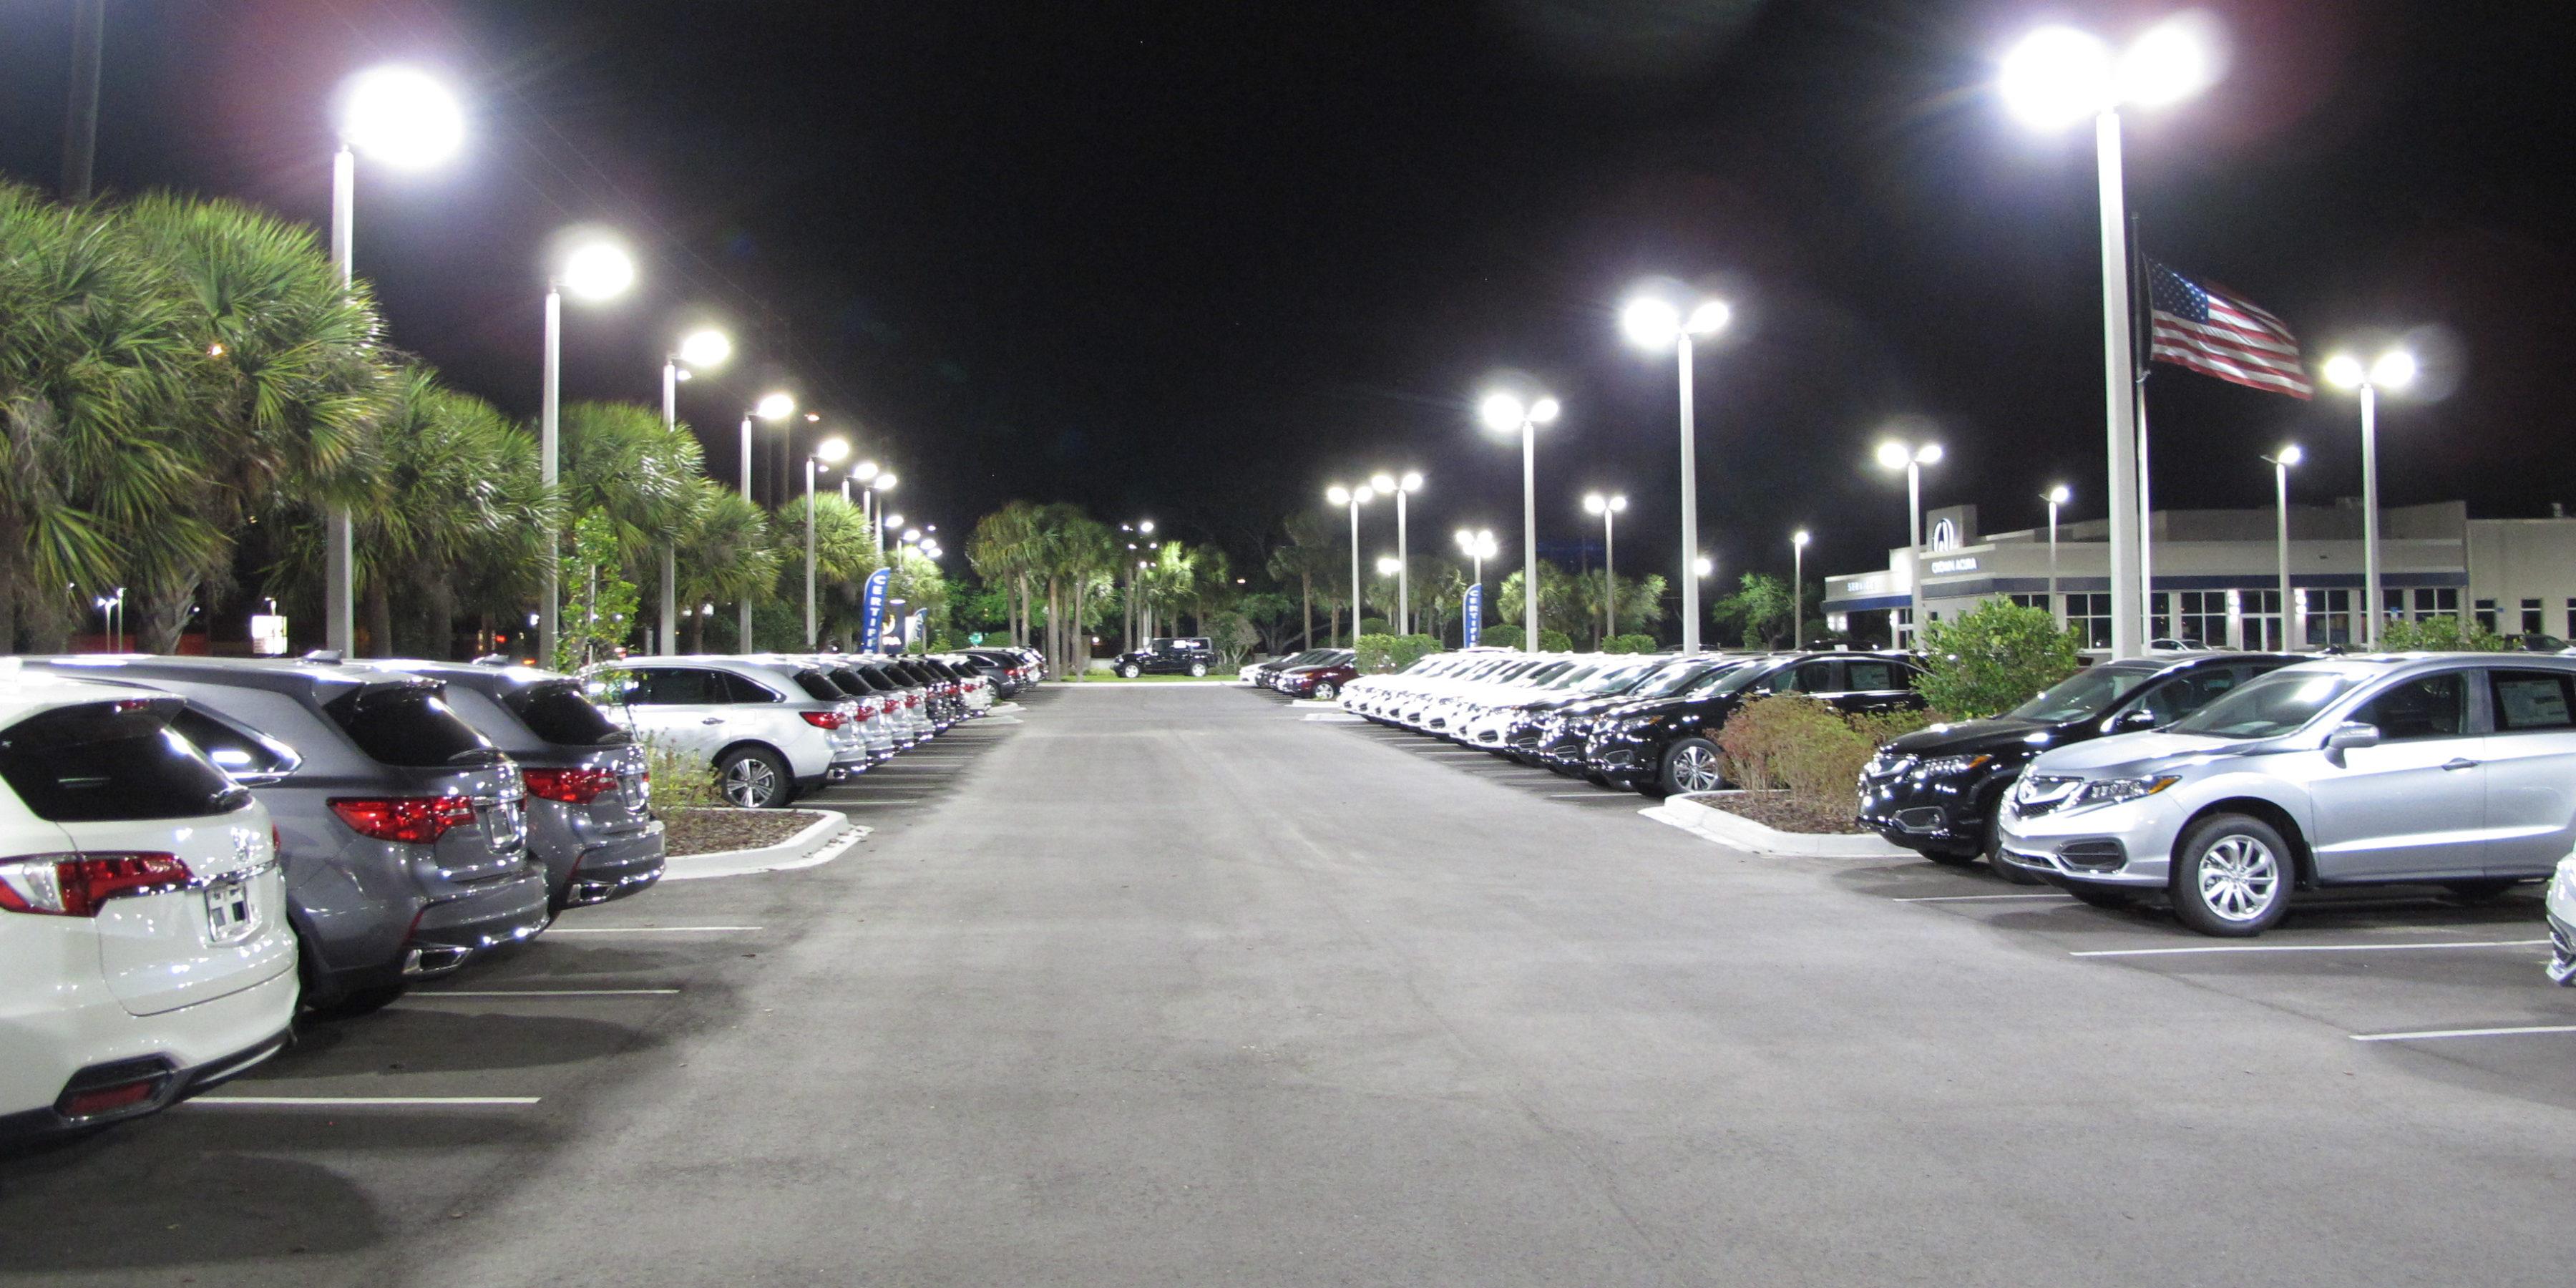 car dealership, led lighting, arkon power, acura, crown acura